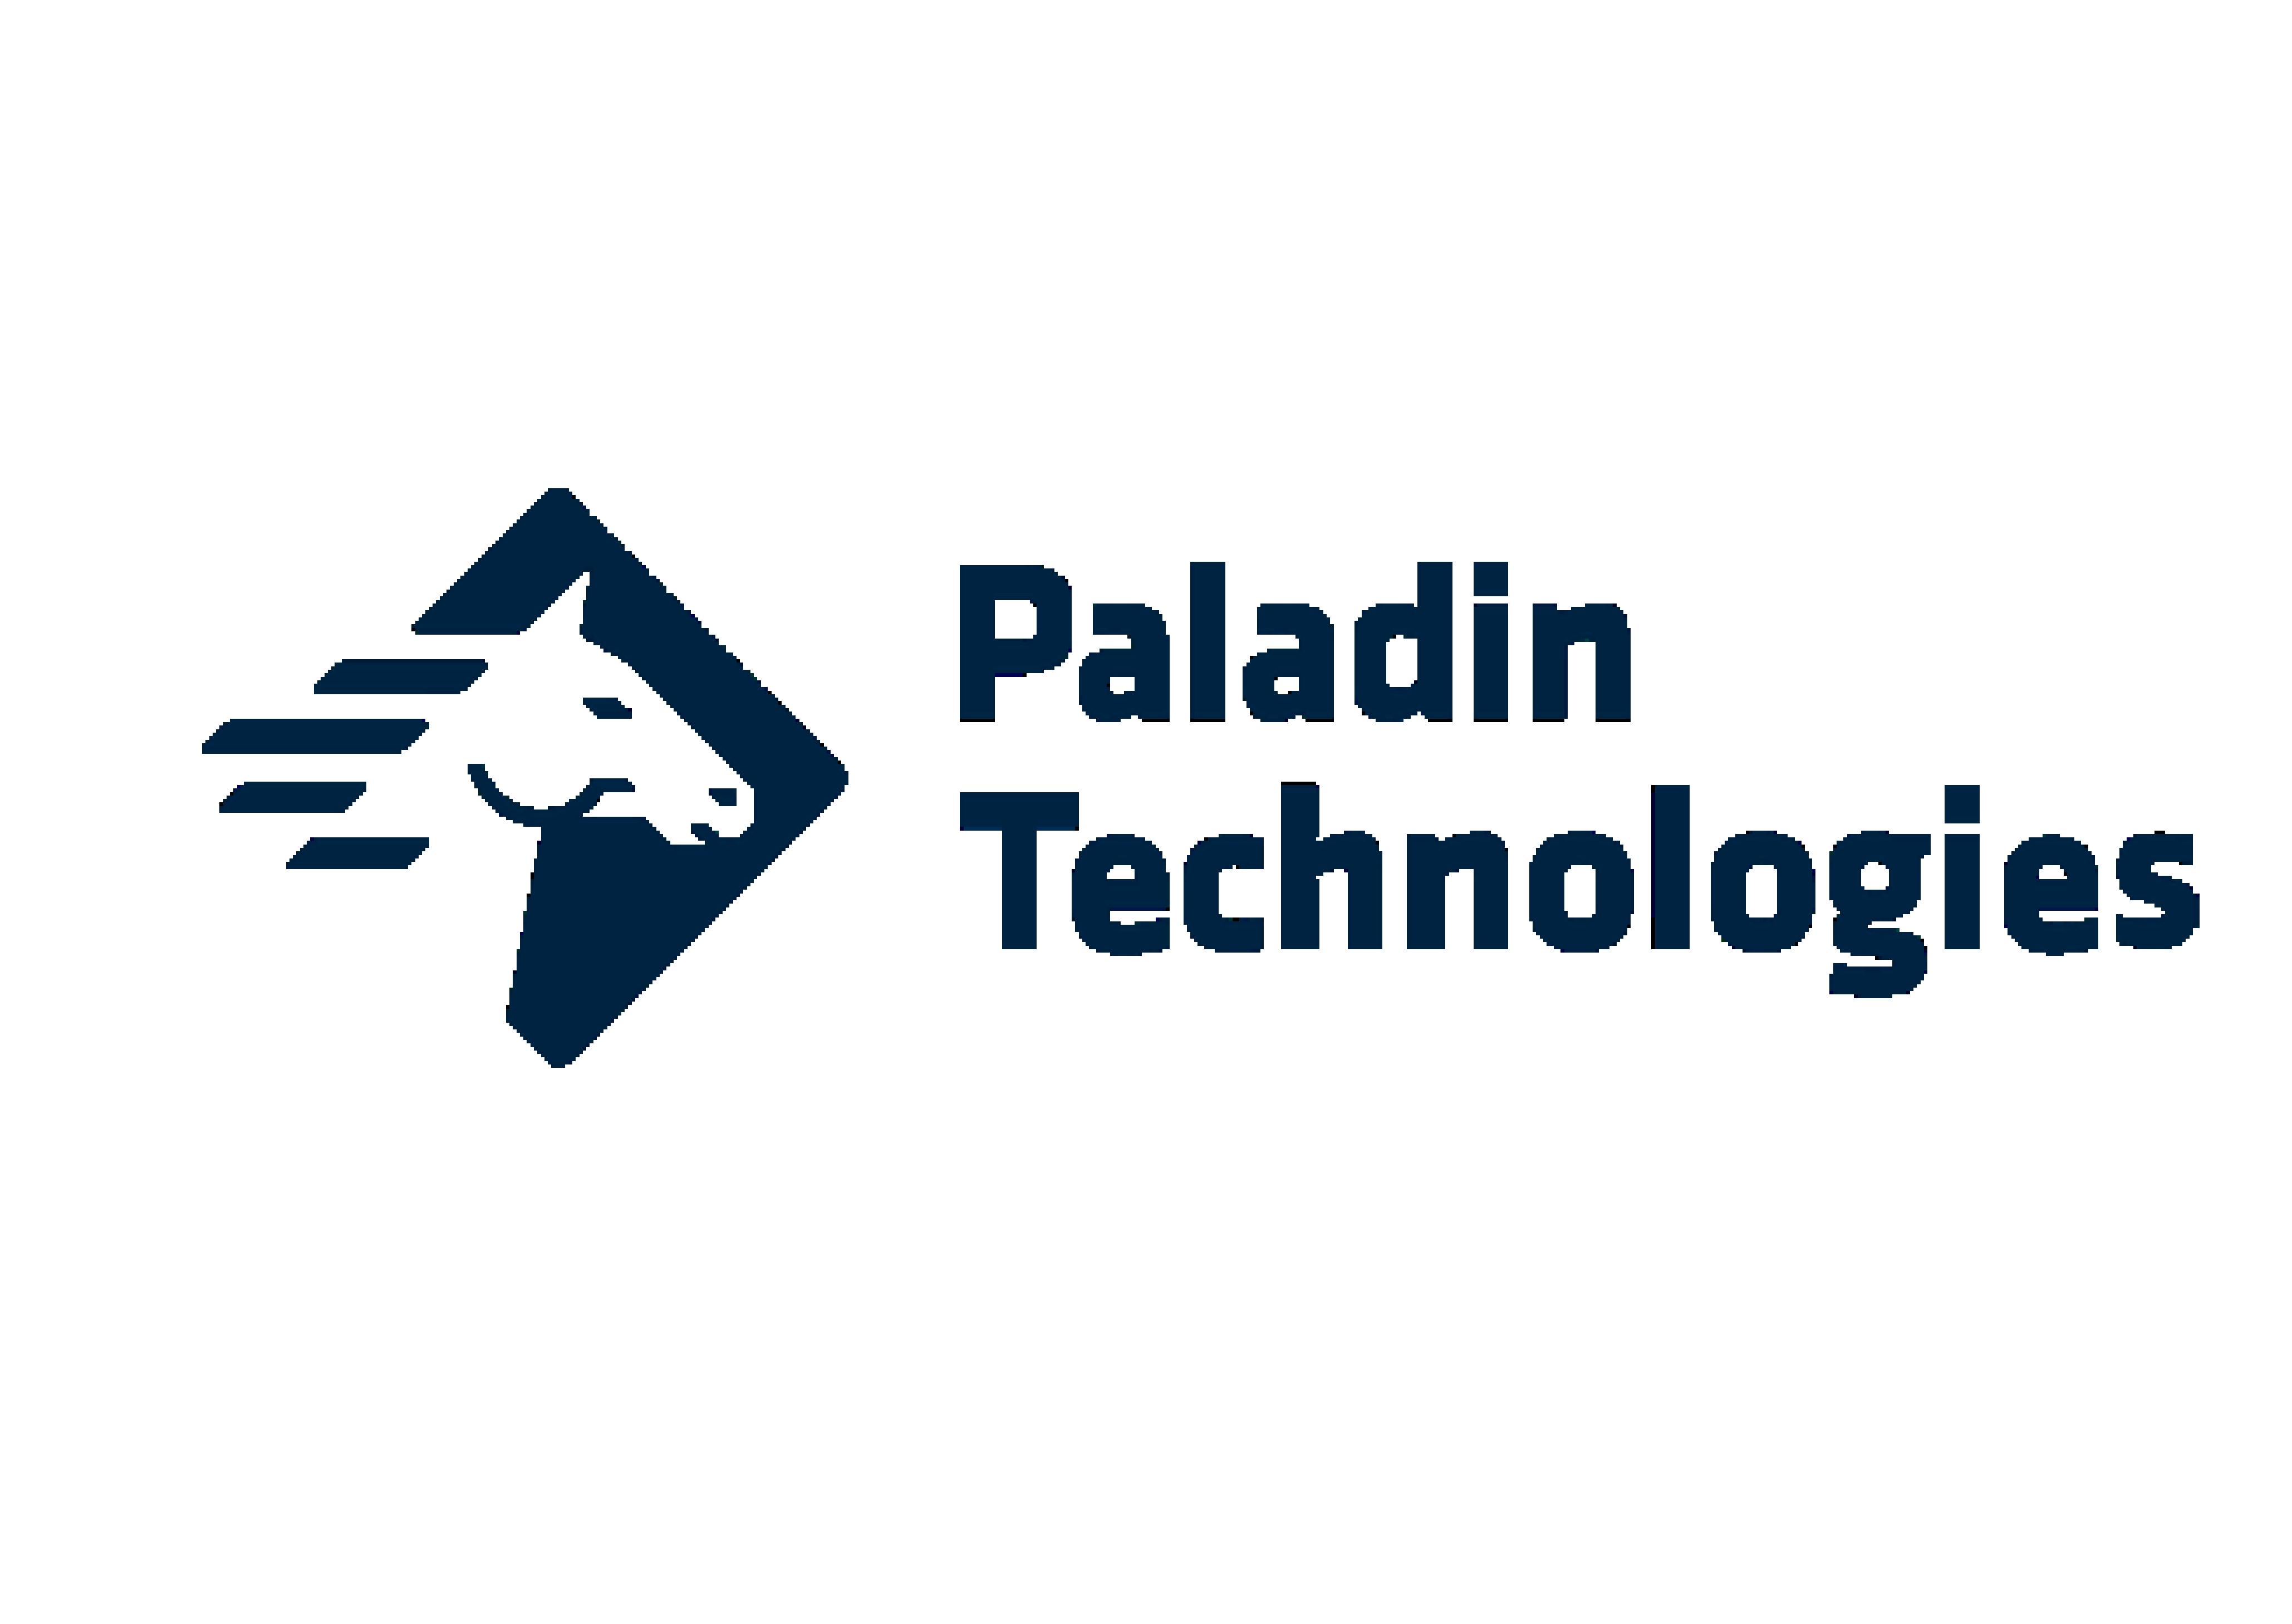 https://palamerican.com/wp-content/uploads/2021/06/PTI-2-01.png